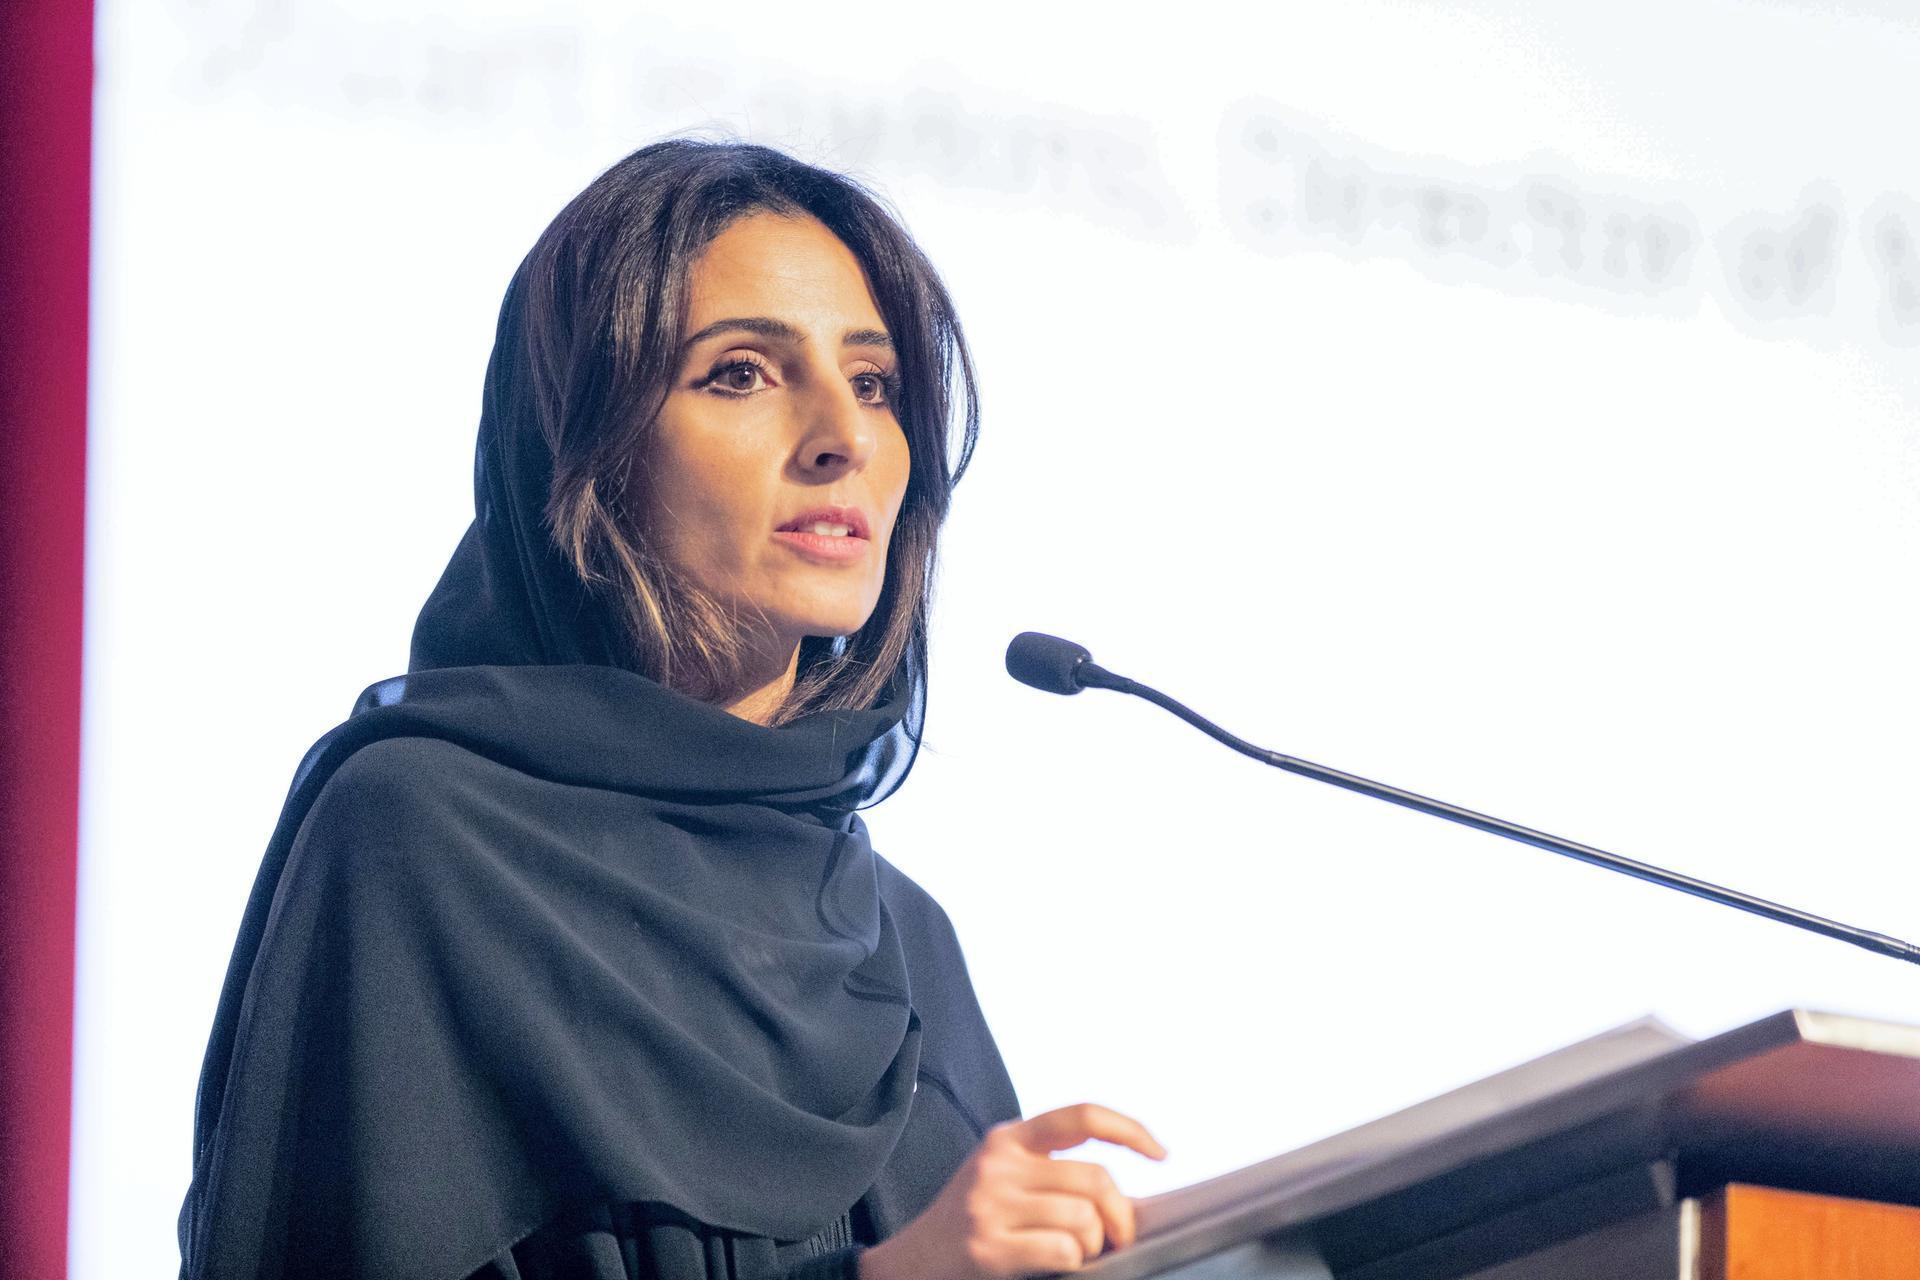 Emirati environmentalist Razan Al Mubarak in running to lead global wildlife agency